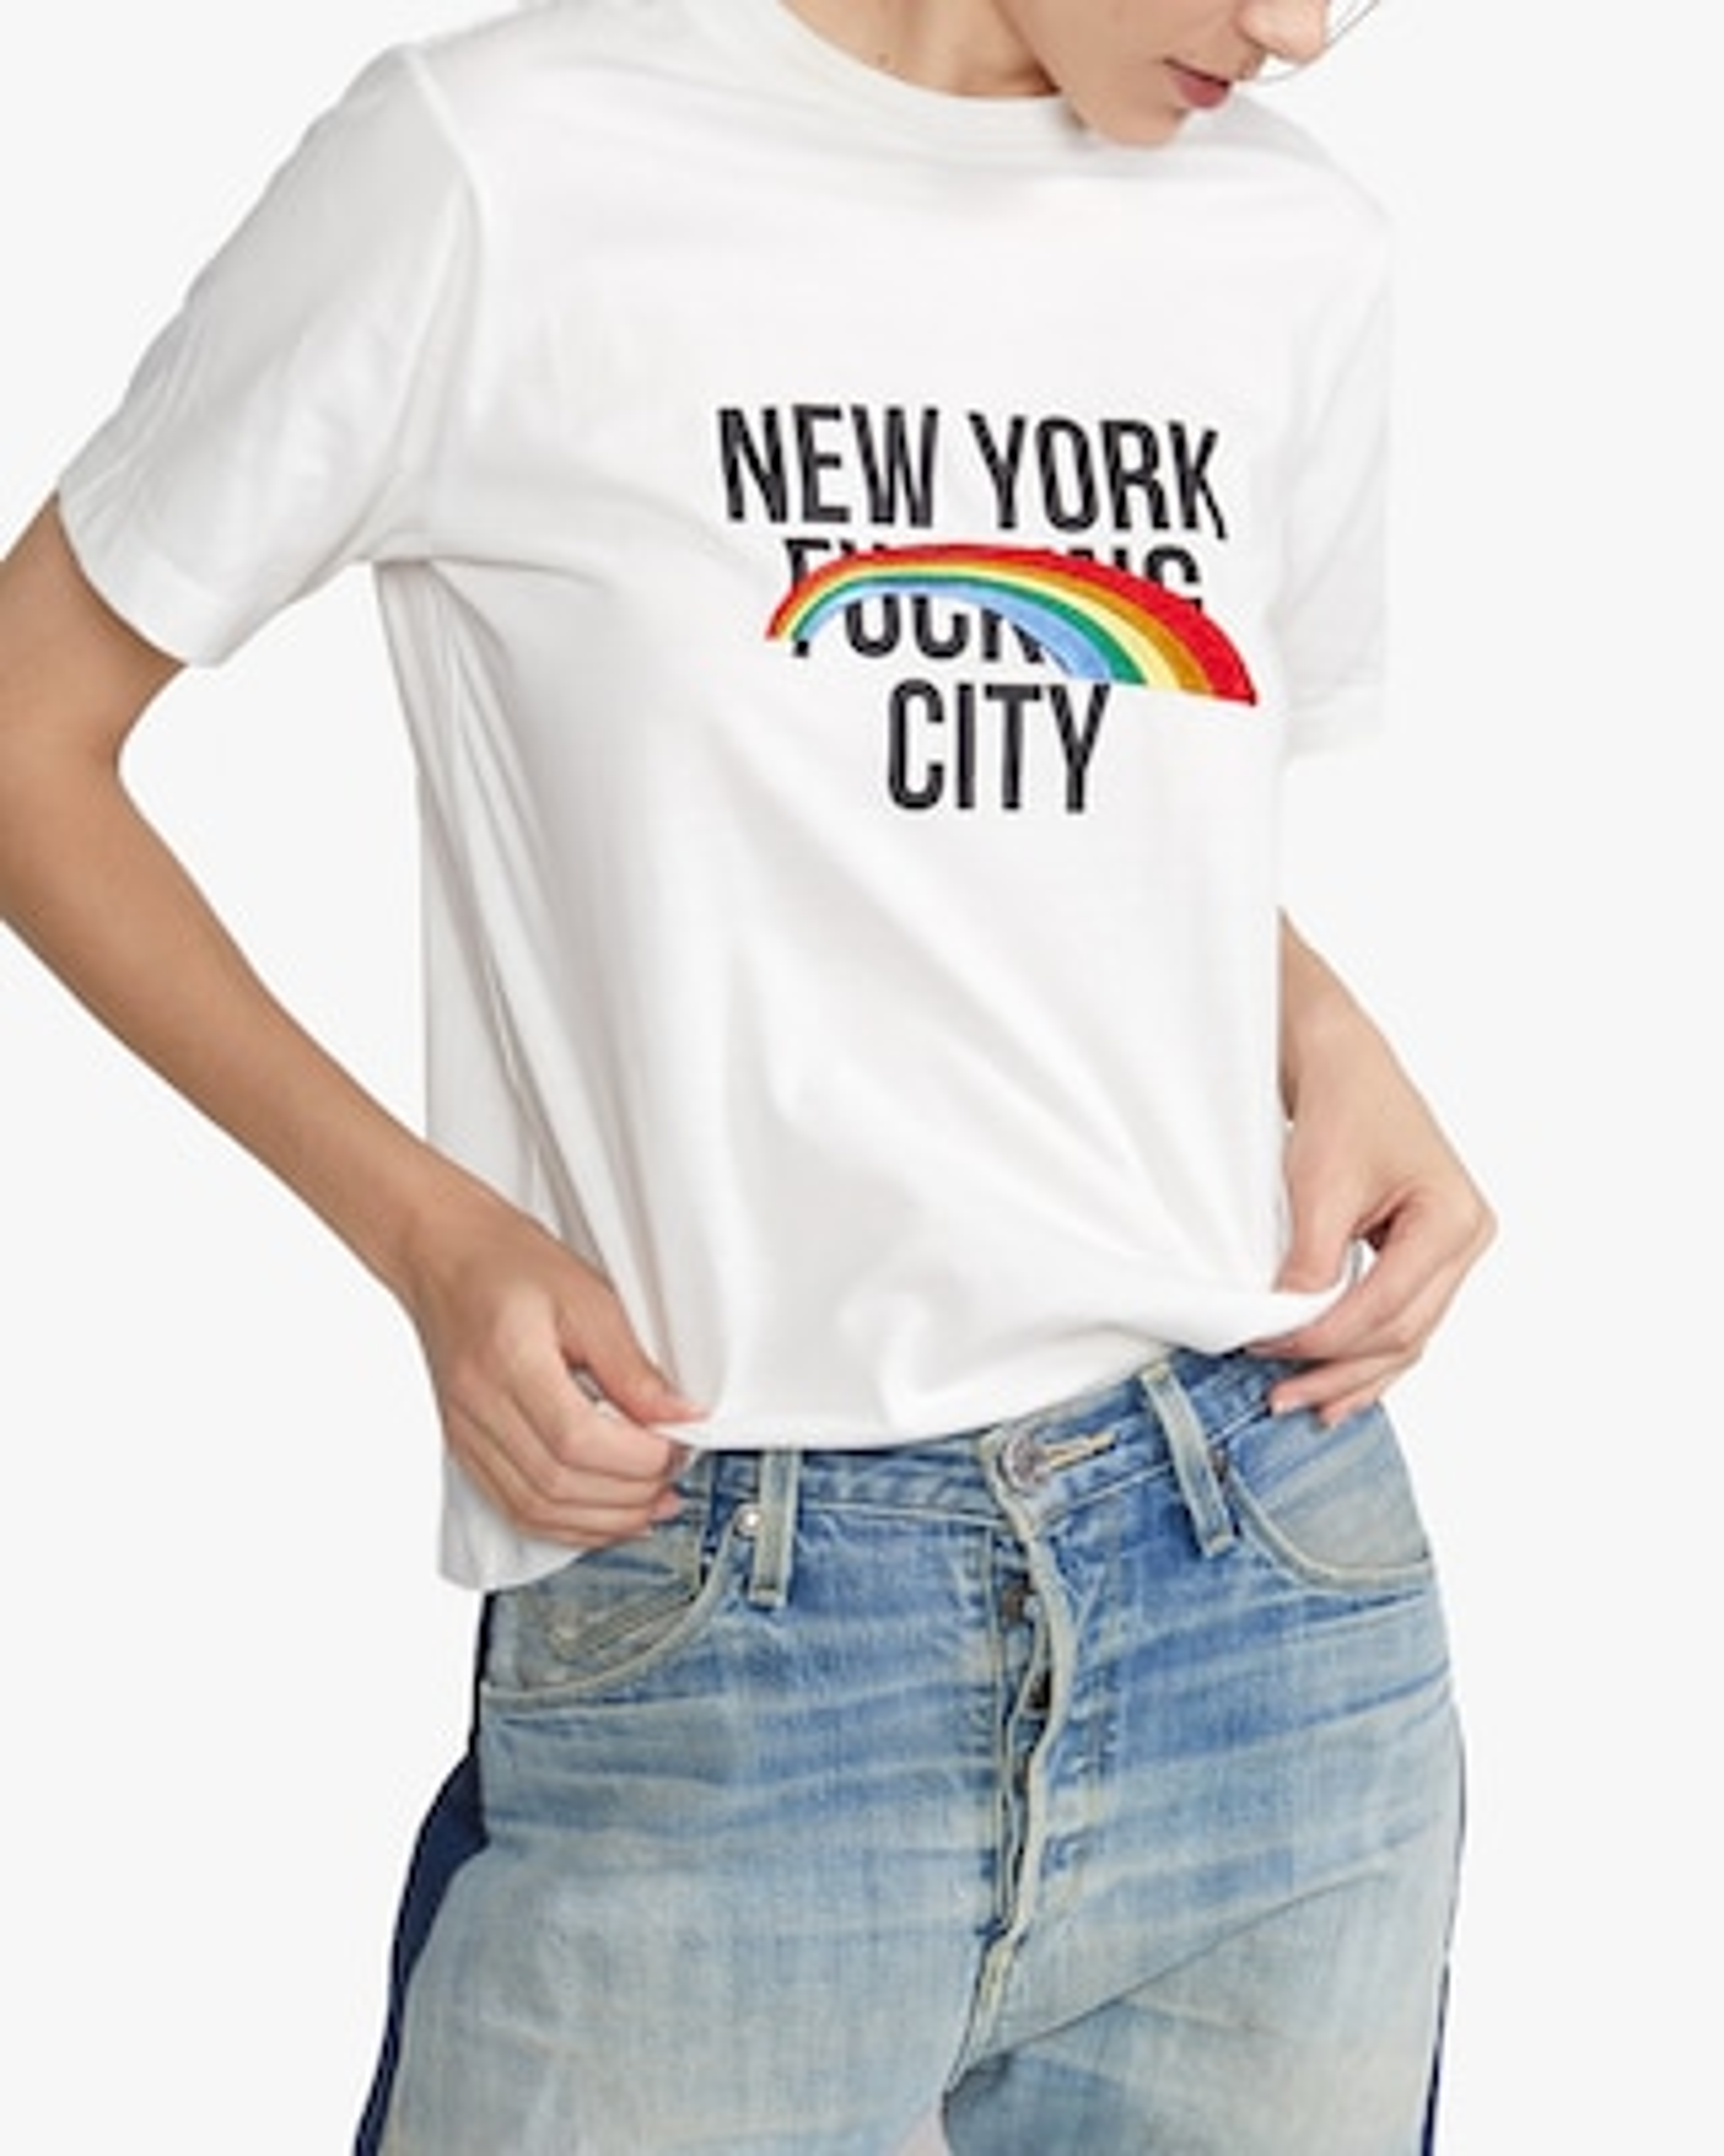 Cynthia Rowley New York Rainbow City Tee 1